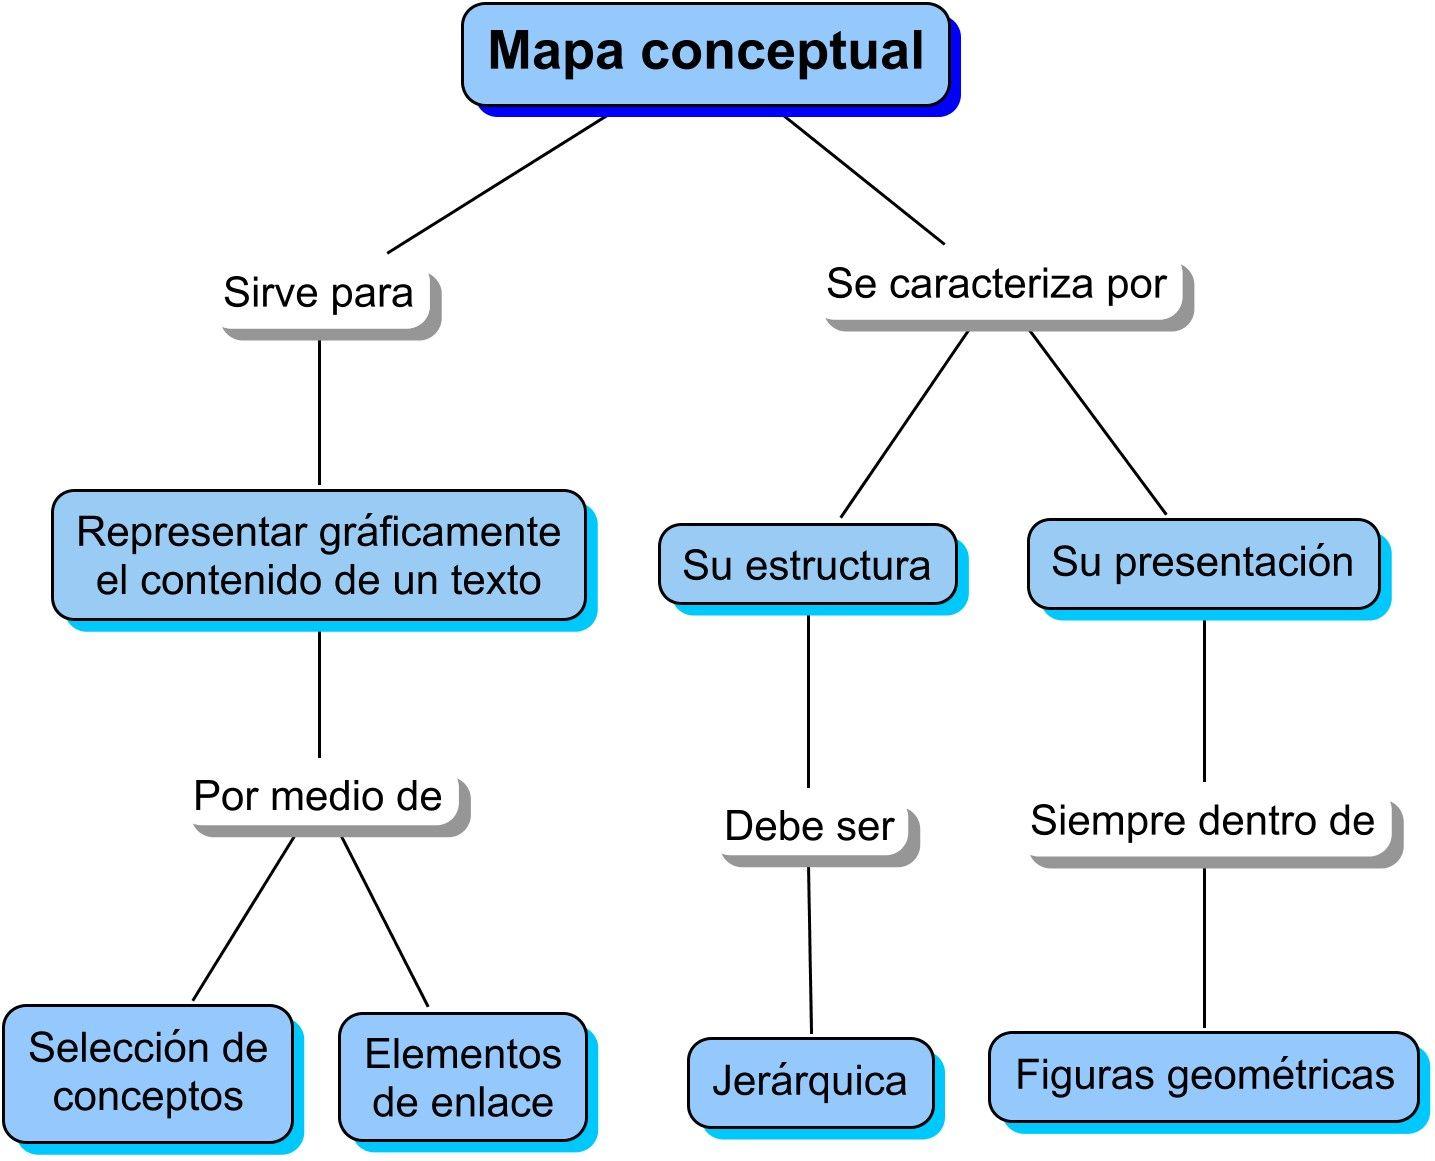 Ejemplos De Mapa Conceptual.Mapa Conceptual De Busqueda Mapa Conceptual Mapas Mentales Y Conceptuales Aprendizaje